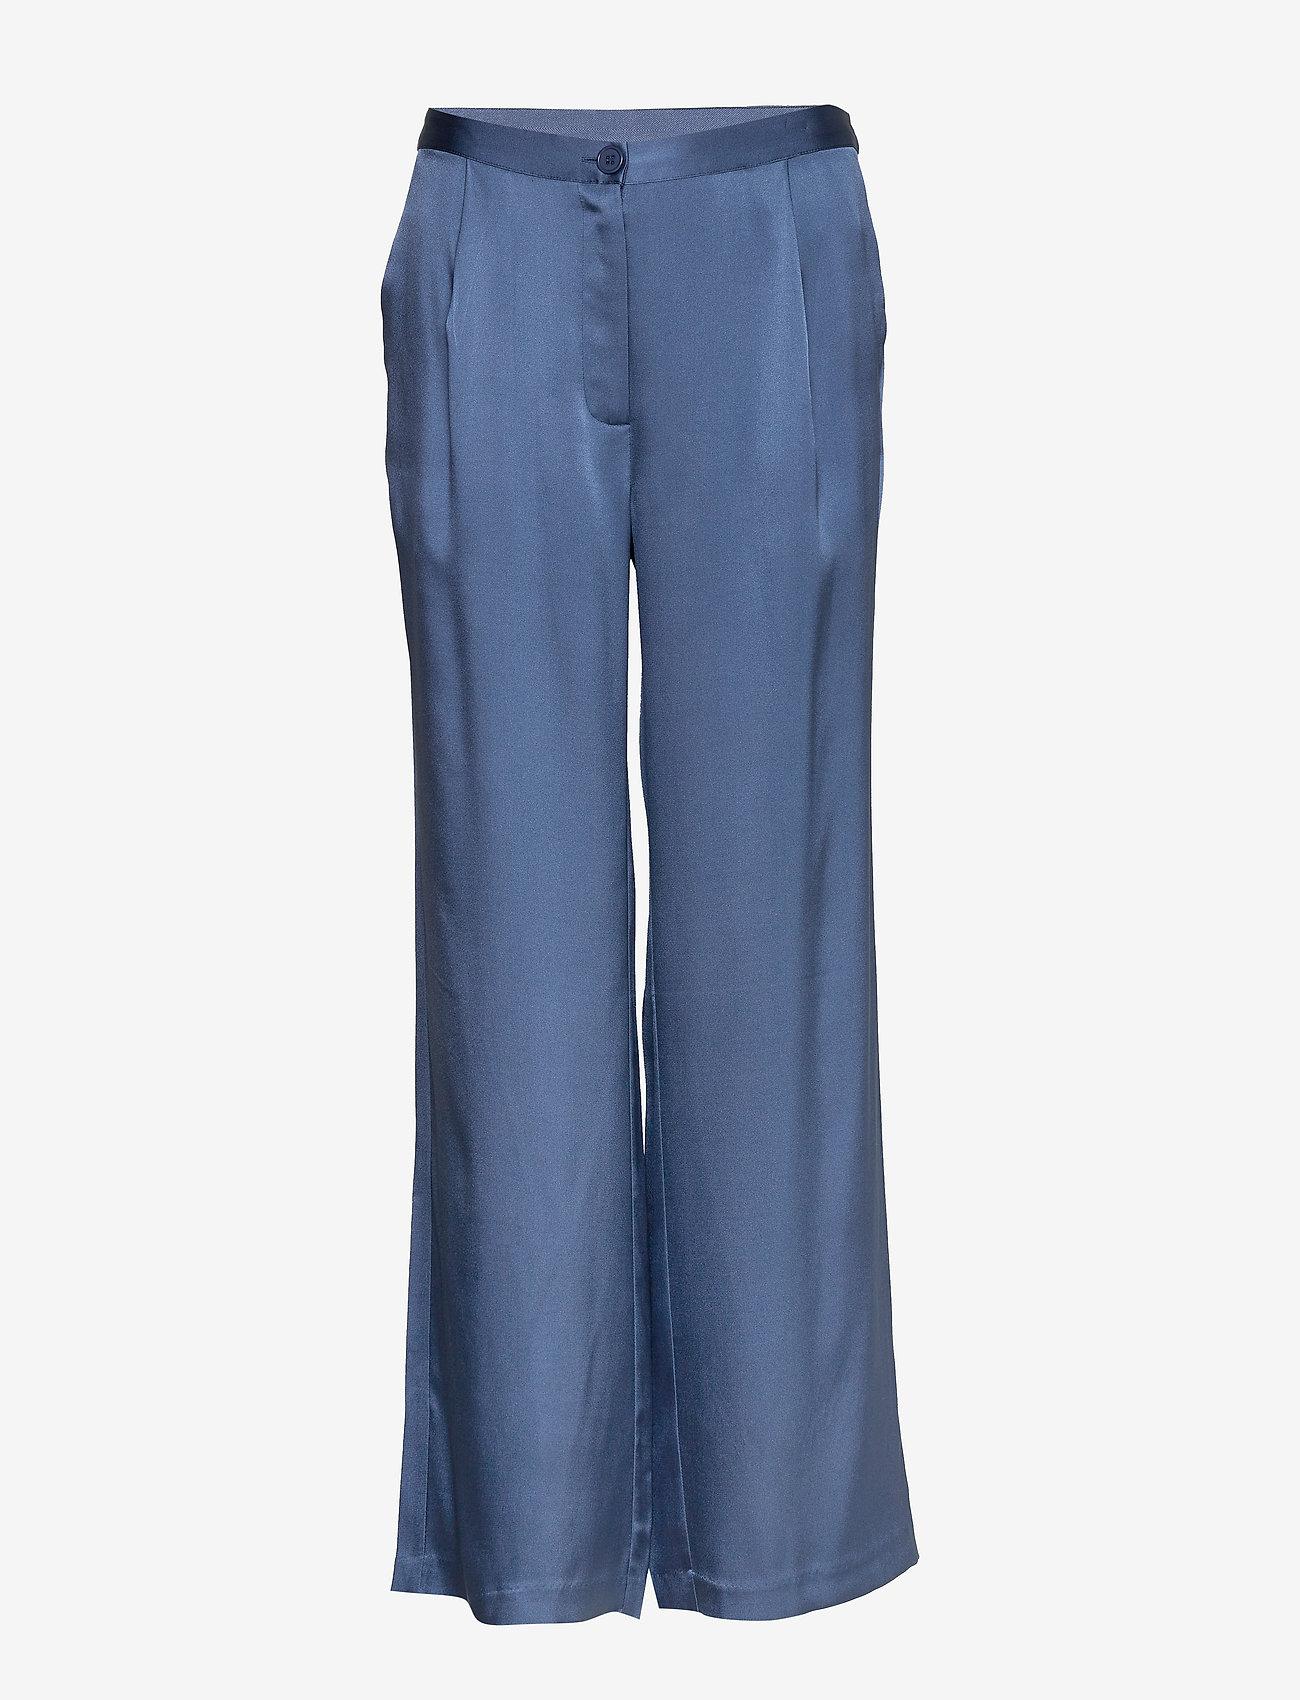 SAND - Double Silk - Sasha Flex Pleated - uitlopende broeken - medium blue - 0